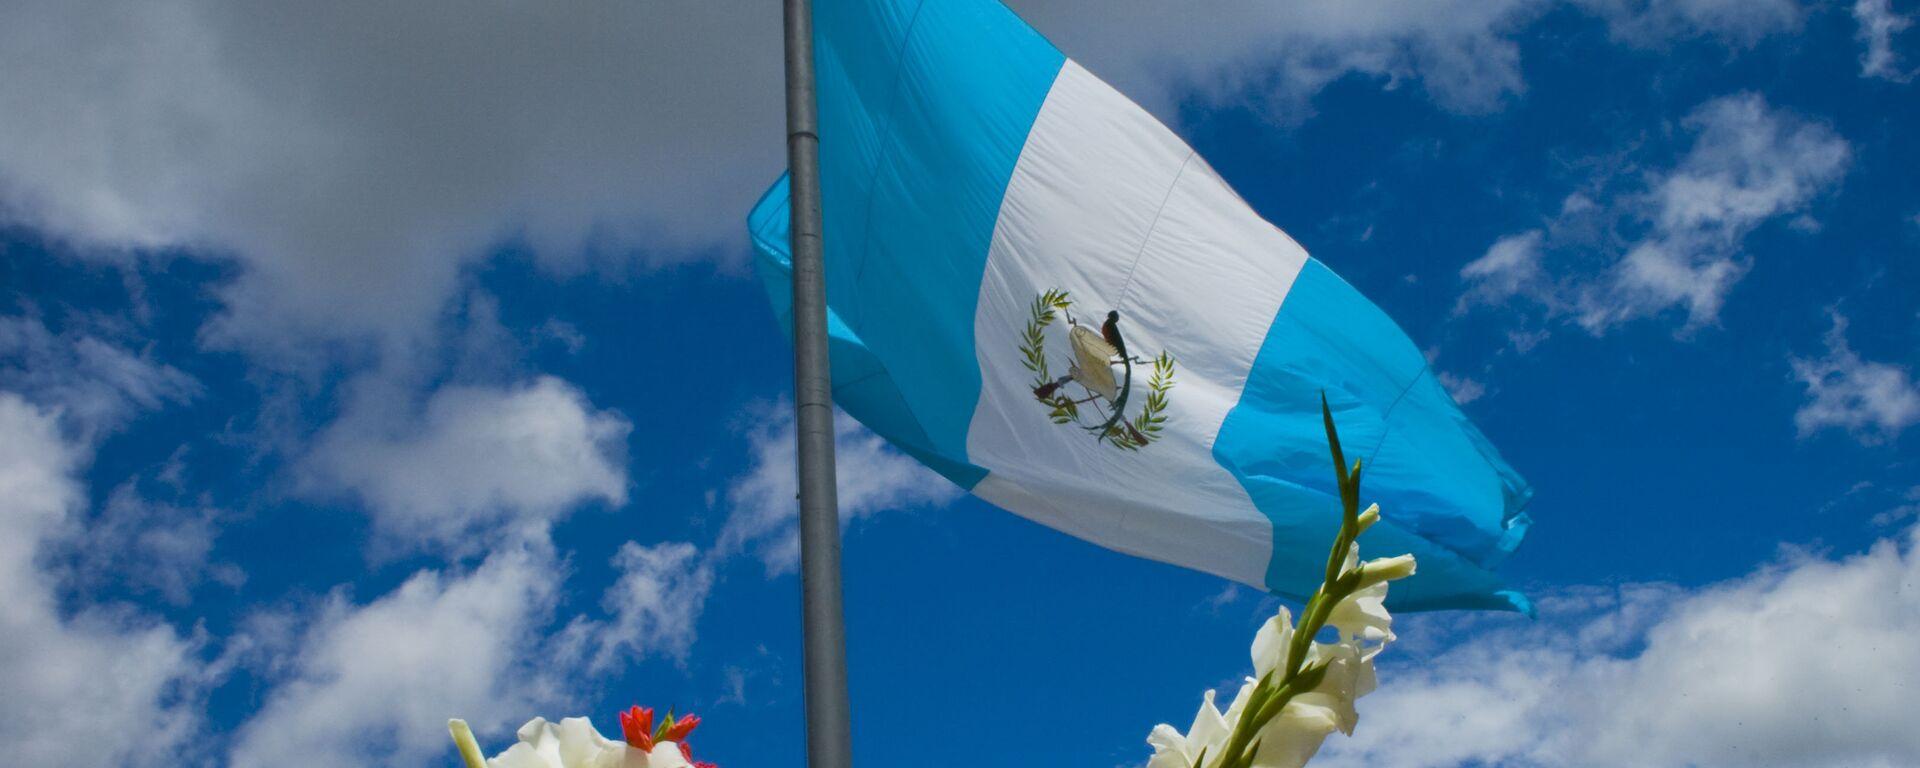 Bandera de Guatemala  - Sputnik Mundo, 1920, 10.06.2021